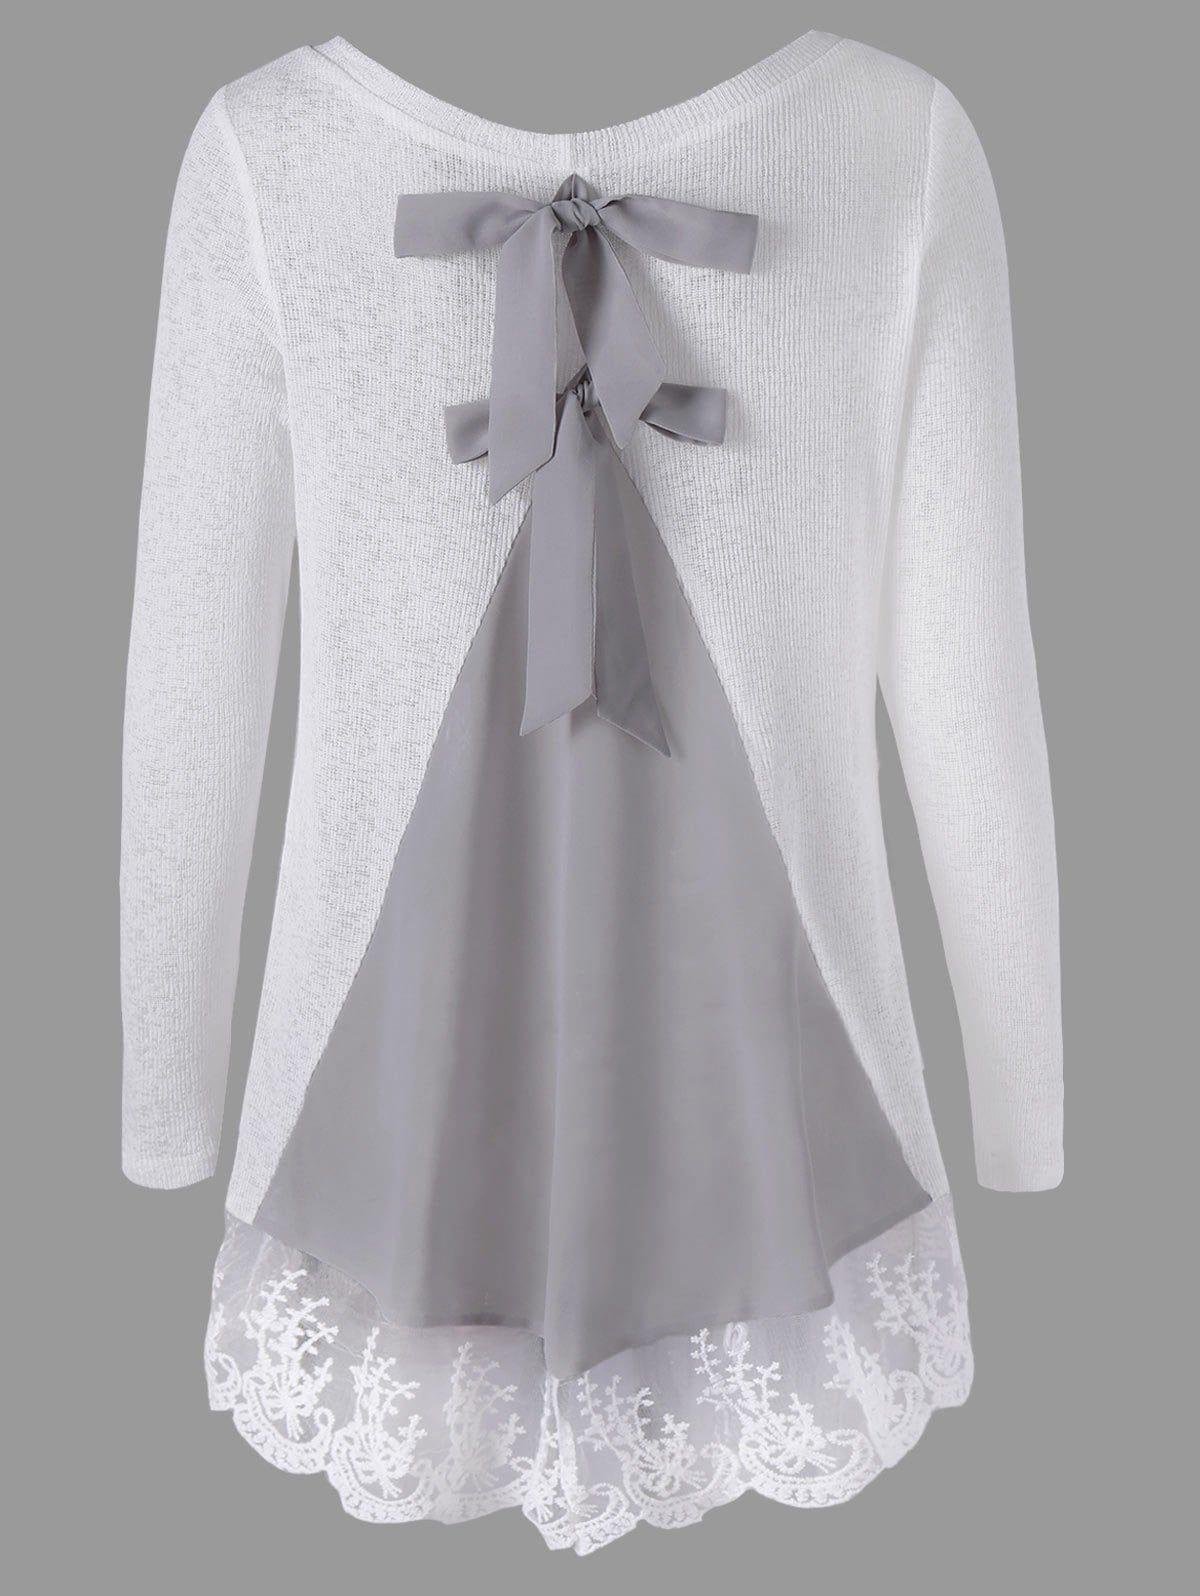 M boutique lace dress  Back Bowknot Lace Panel Long Sleeve Knit Top  Шитье  Pinterest